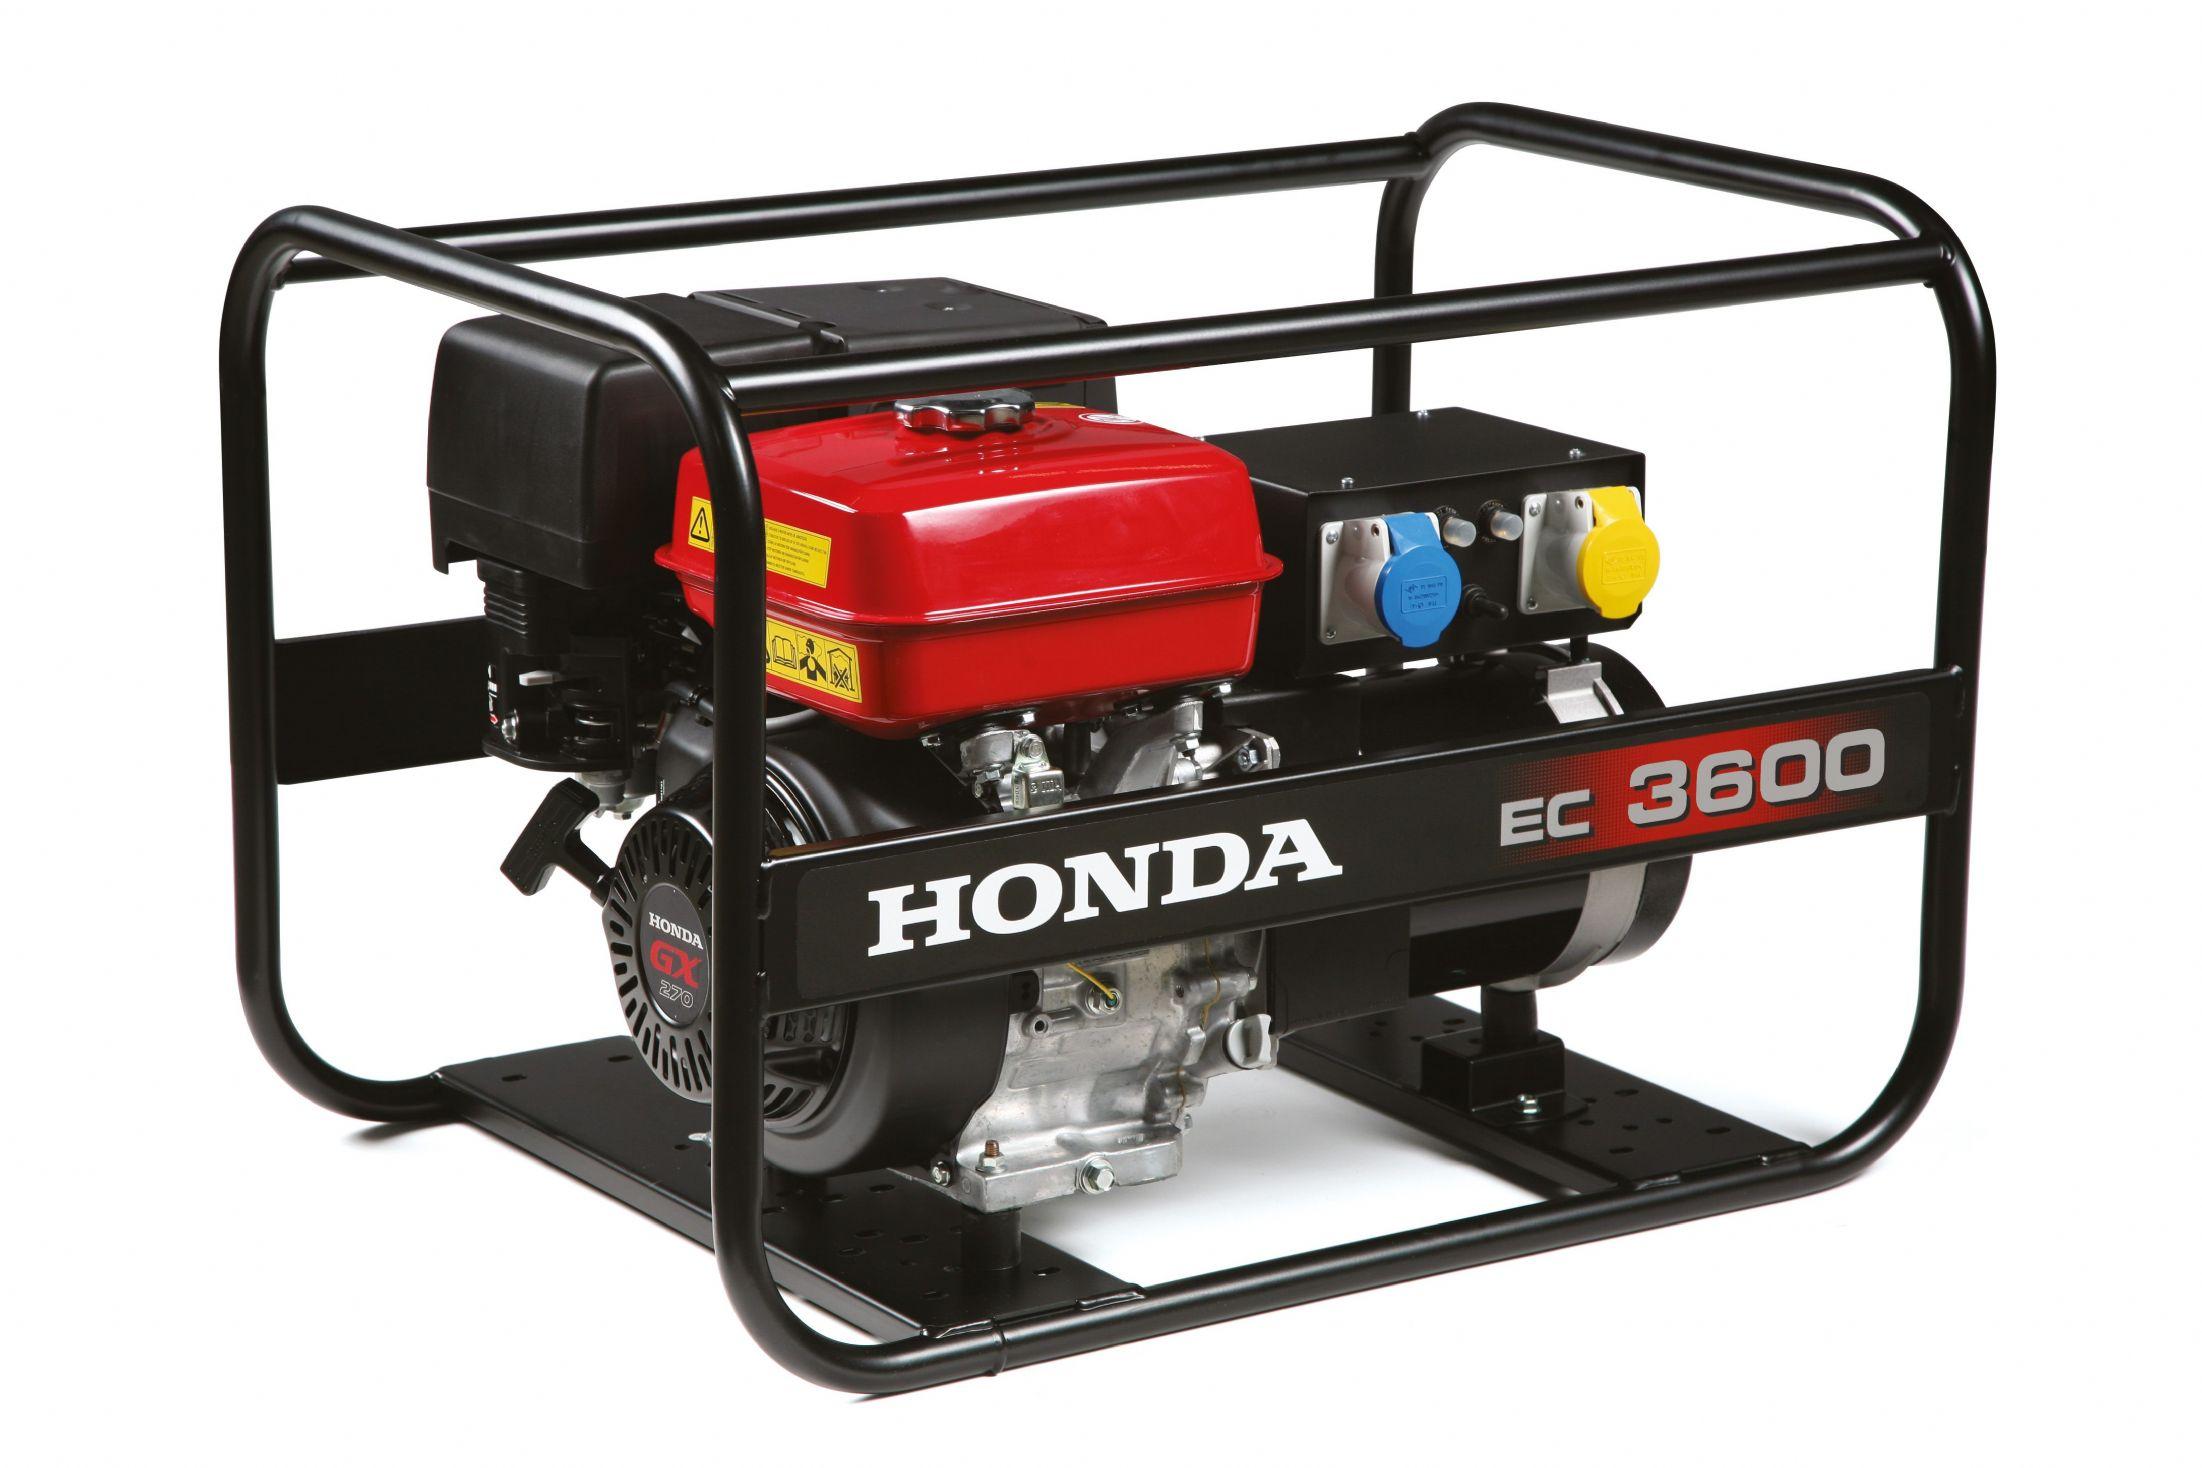 - Honda EC 3600 duurzaam aggregaat/generator